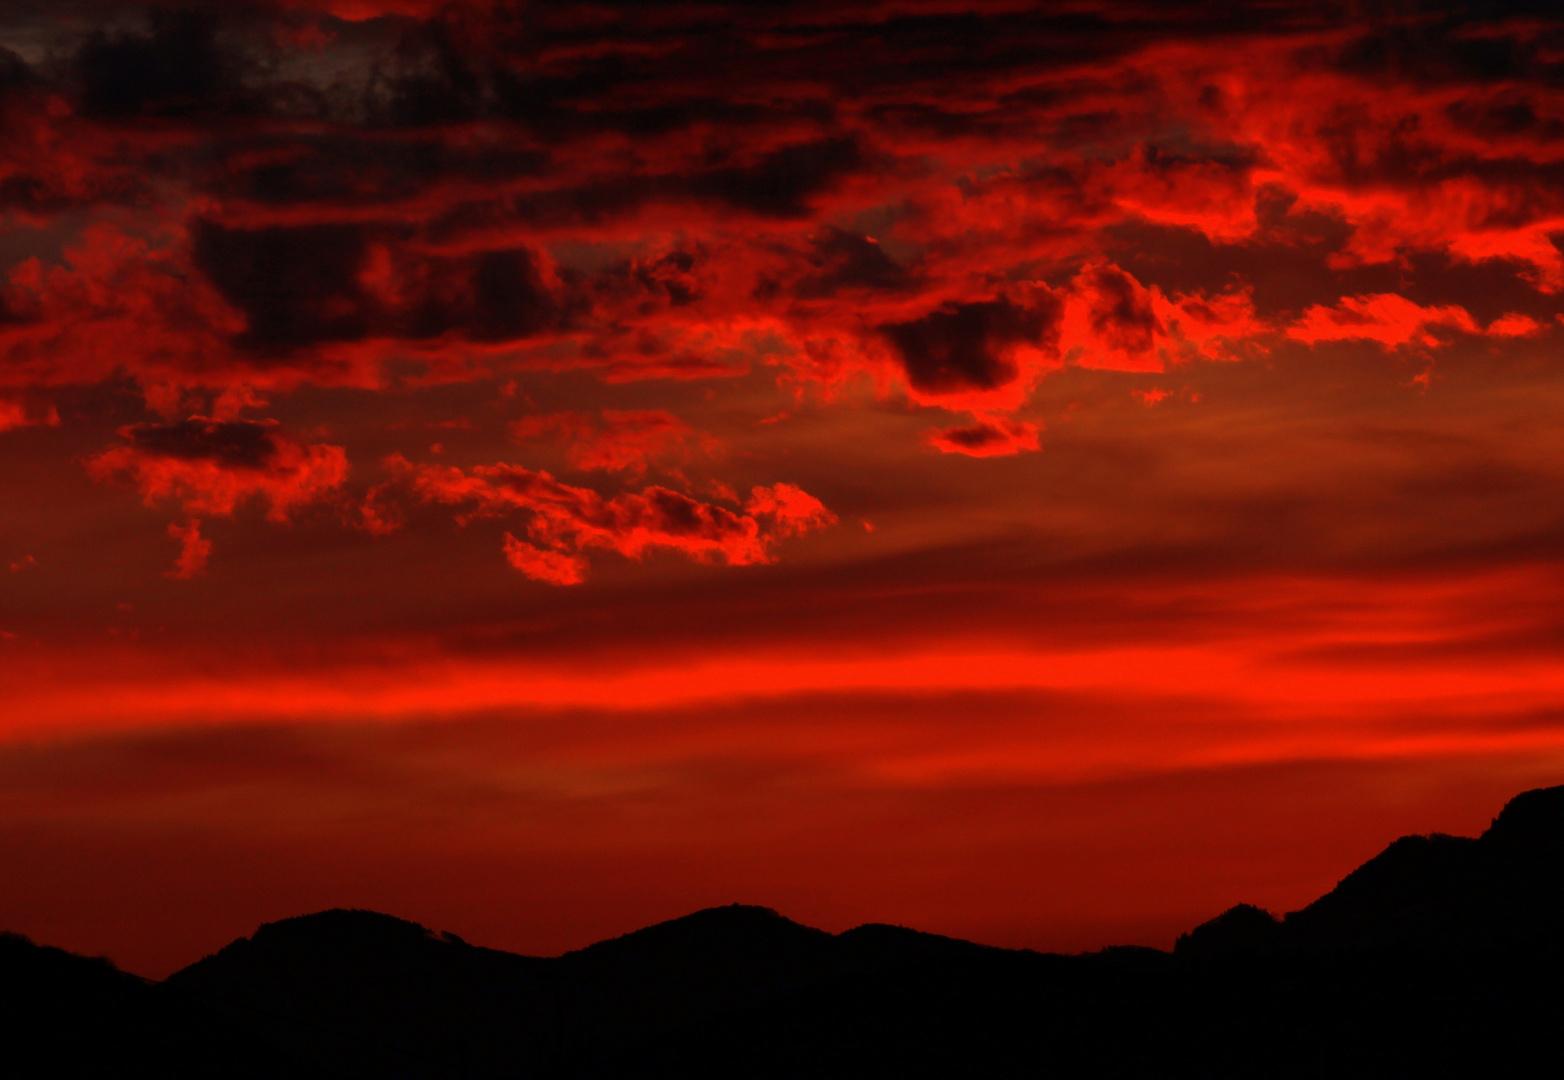 Sonnenaufgang phasen 1